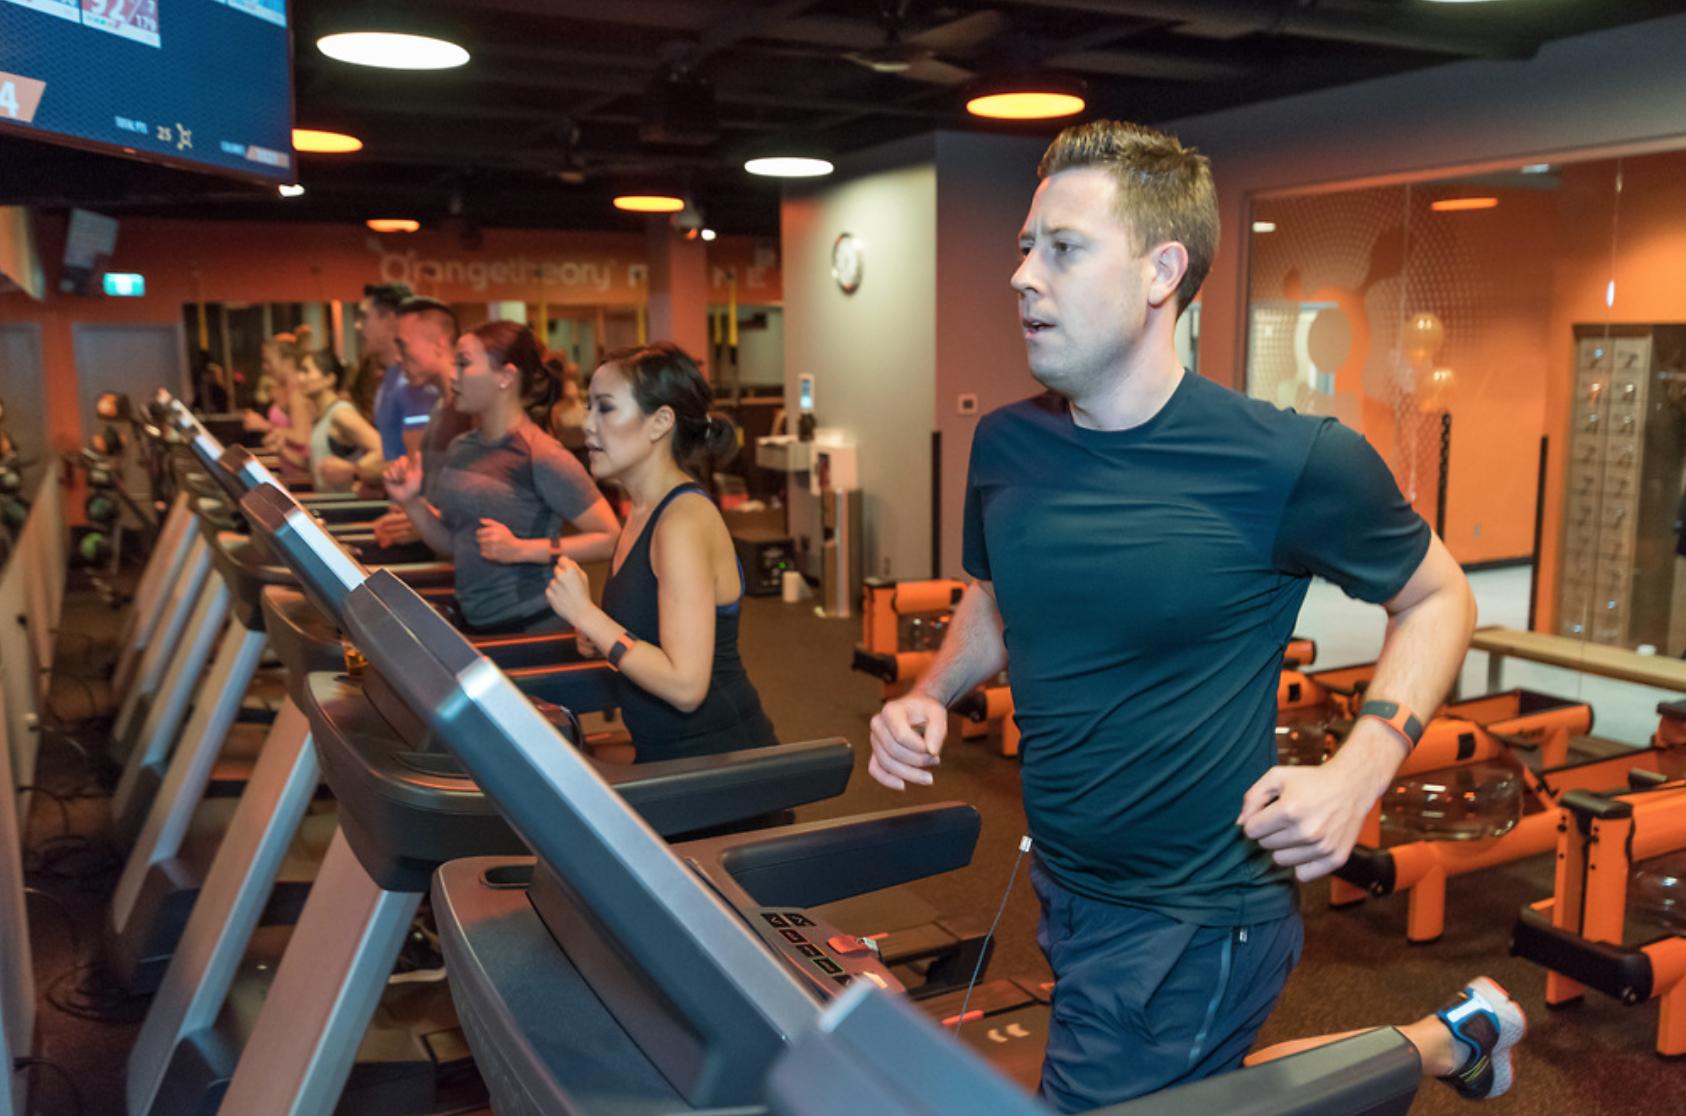 Treadmills at Orangetheory on Davie Street